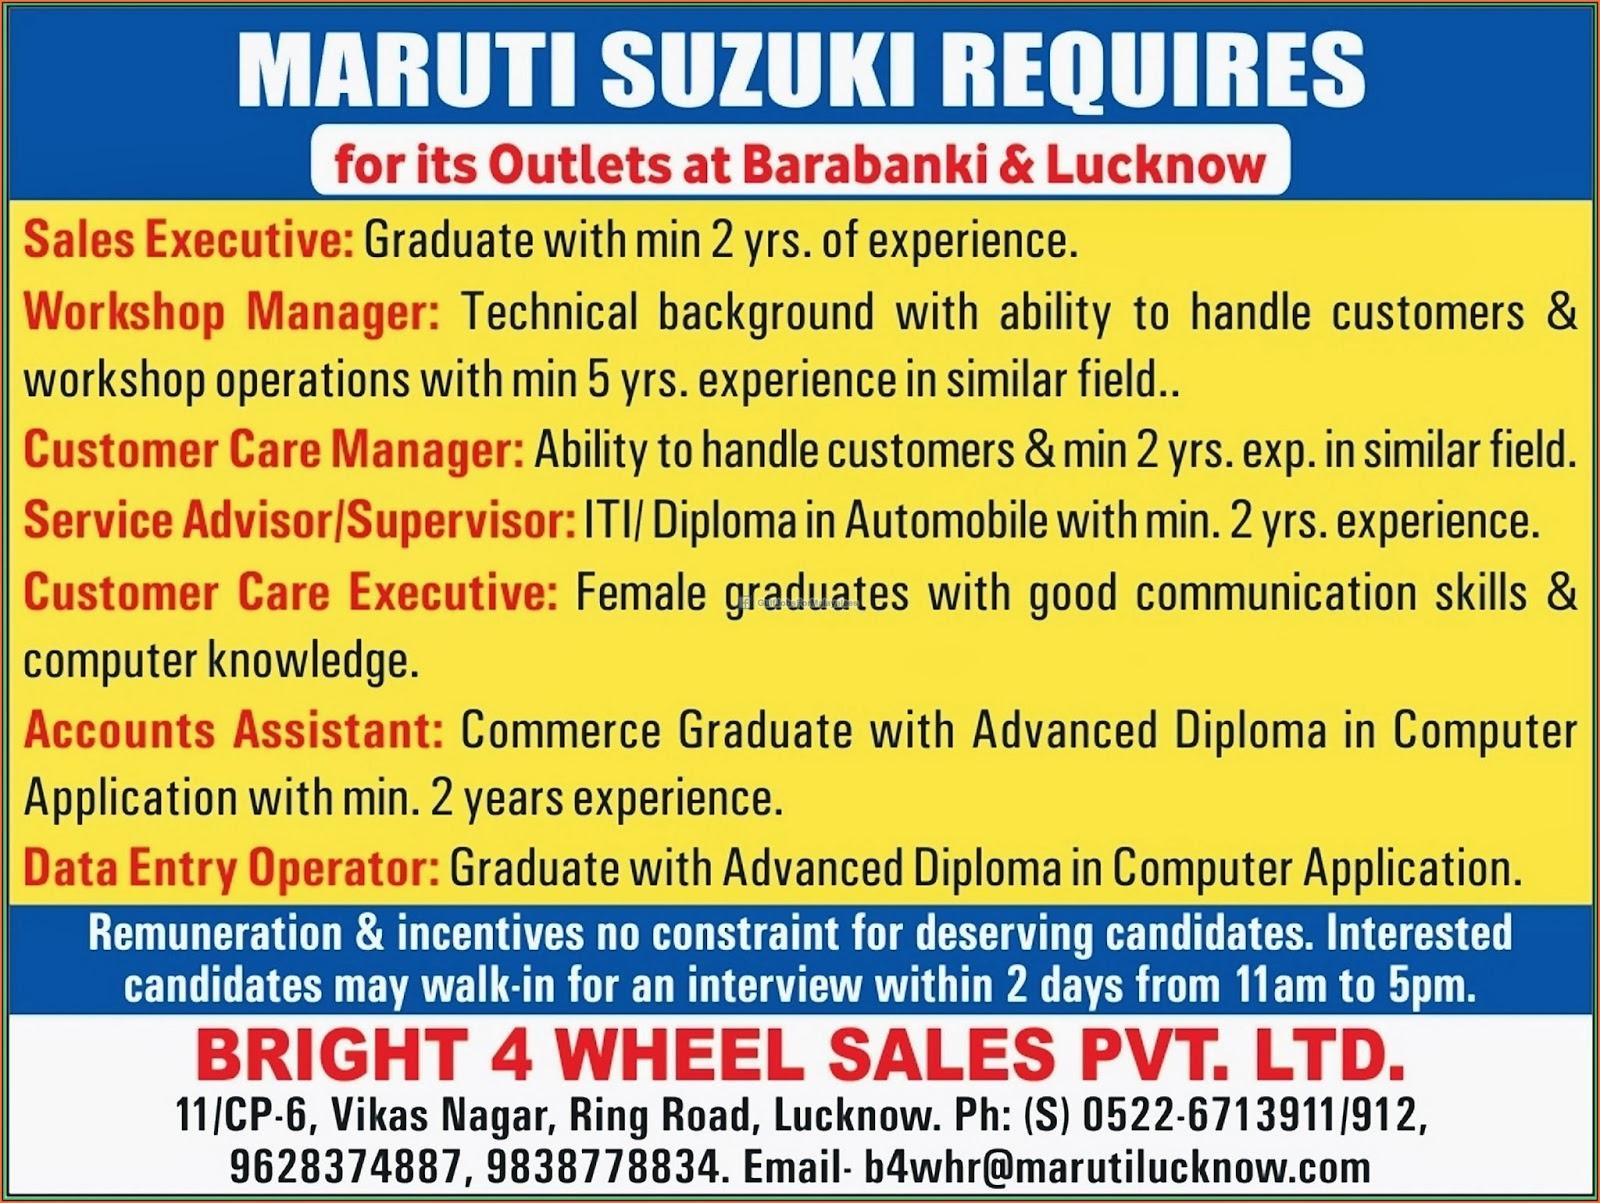 Maruti Suzuki Requires Urgent Vacancies - Gulf Jobs for Malayalees